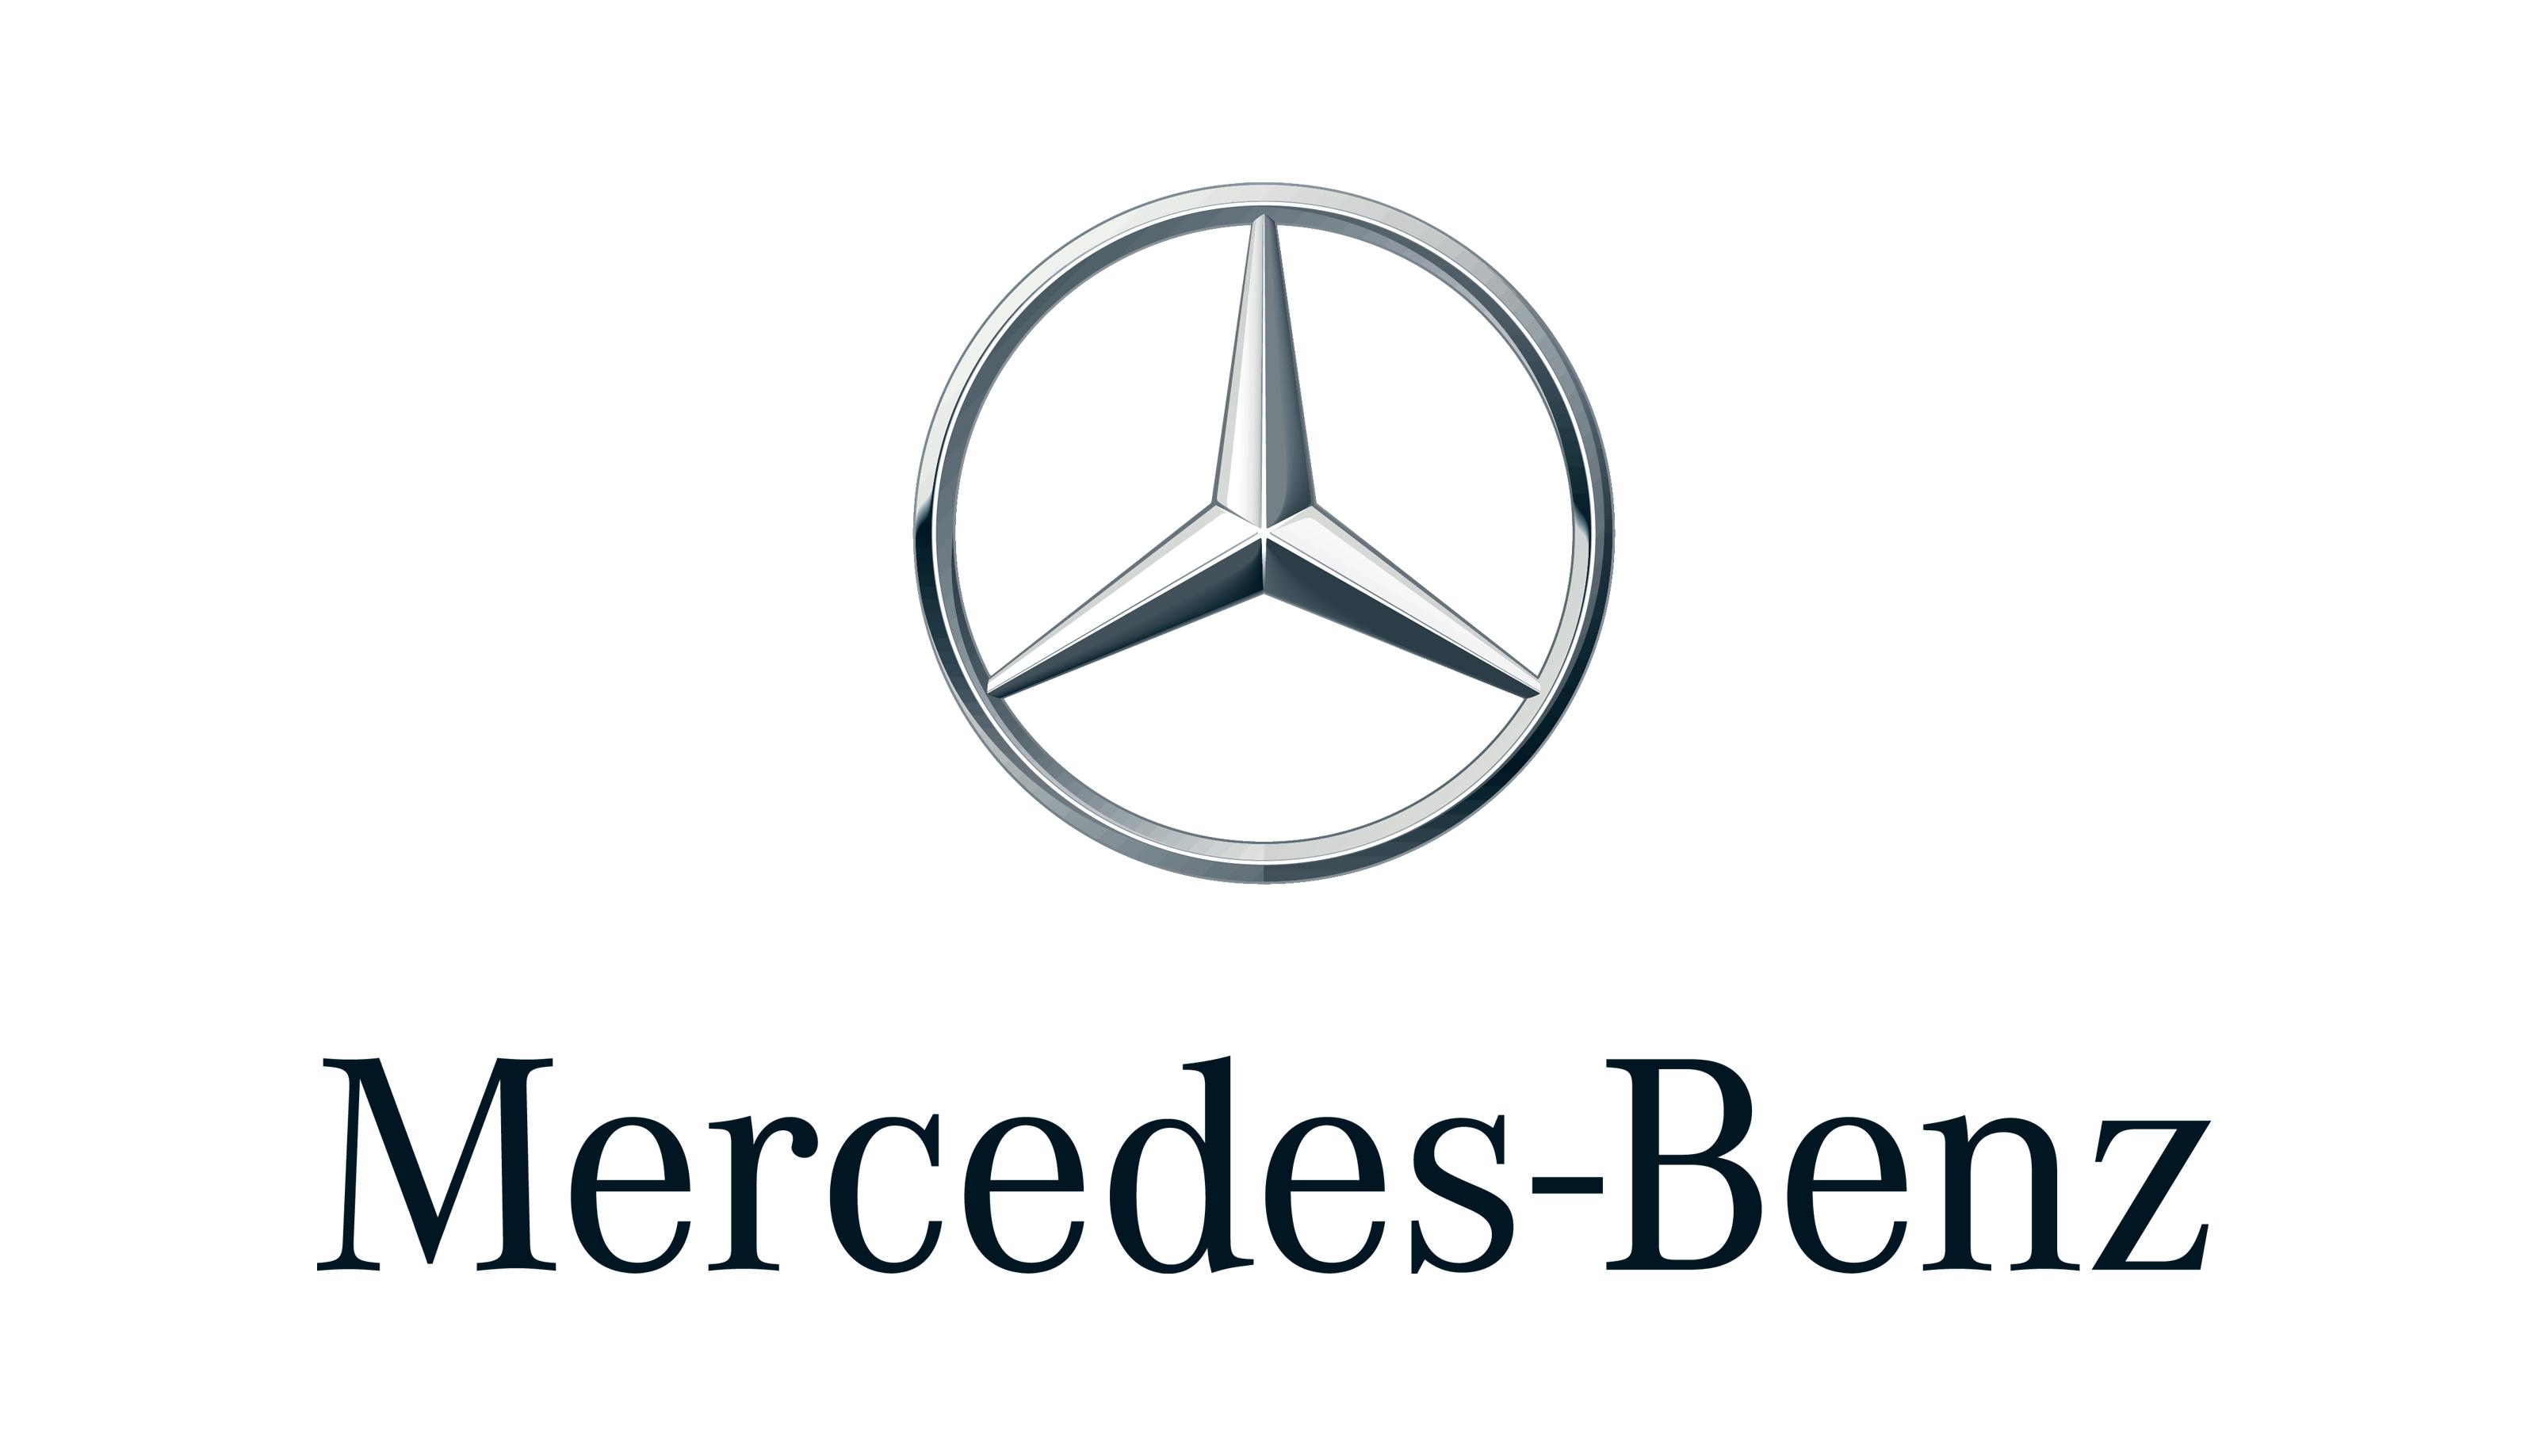 Mercedes-Benz Innovation